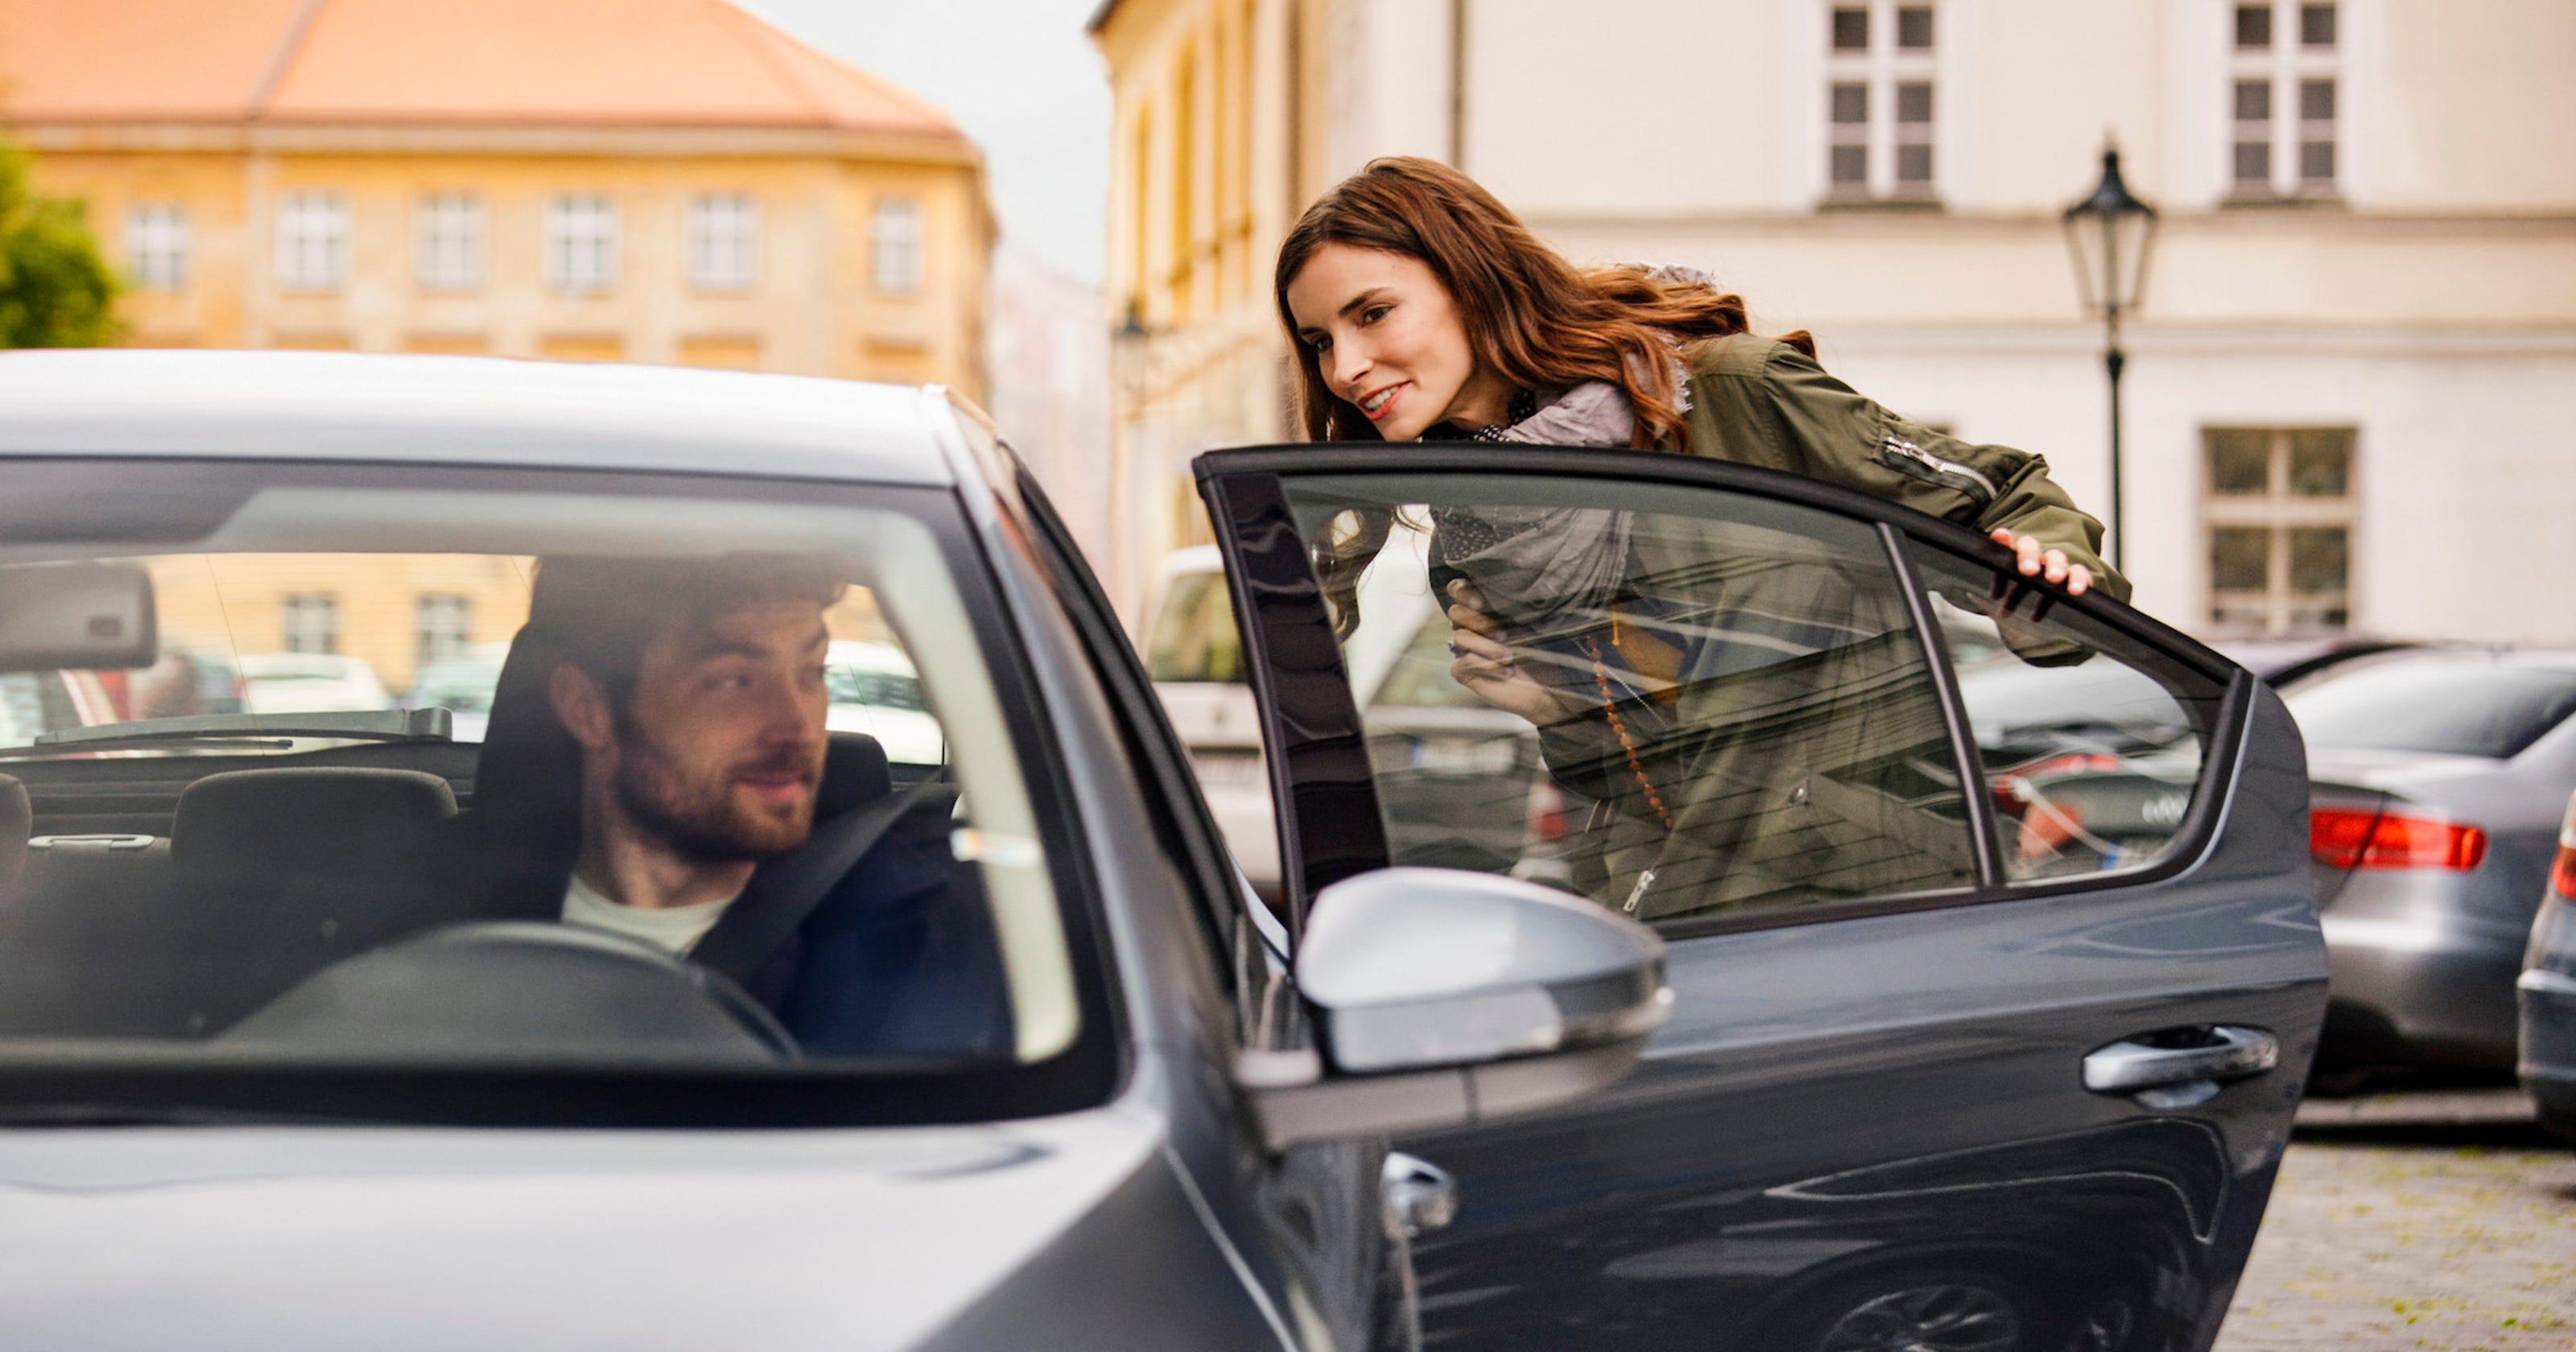 Samantha Josephson Death Safety Tips For Using Uber Lyft